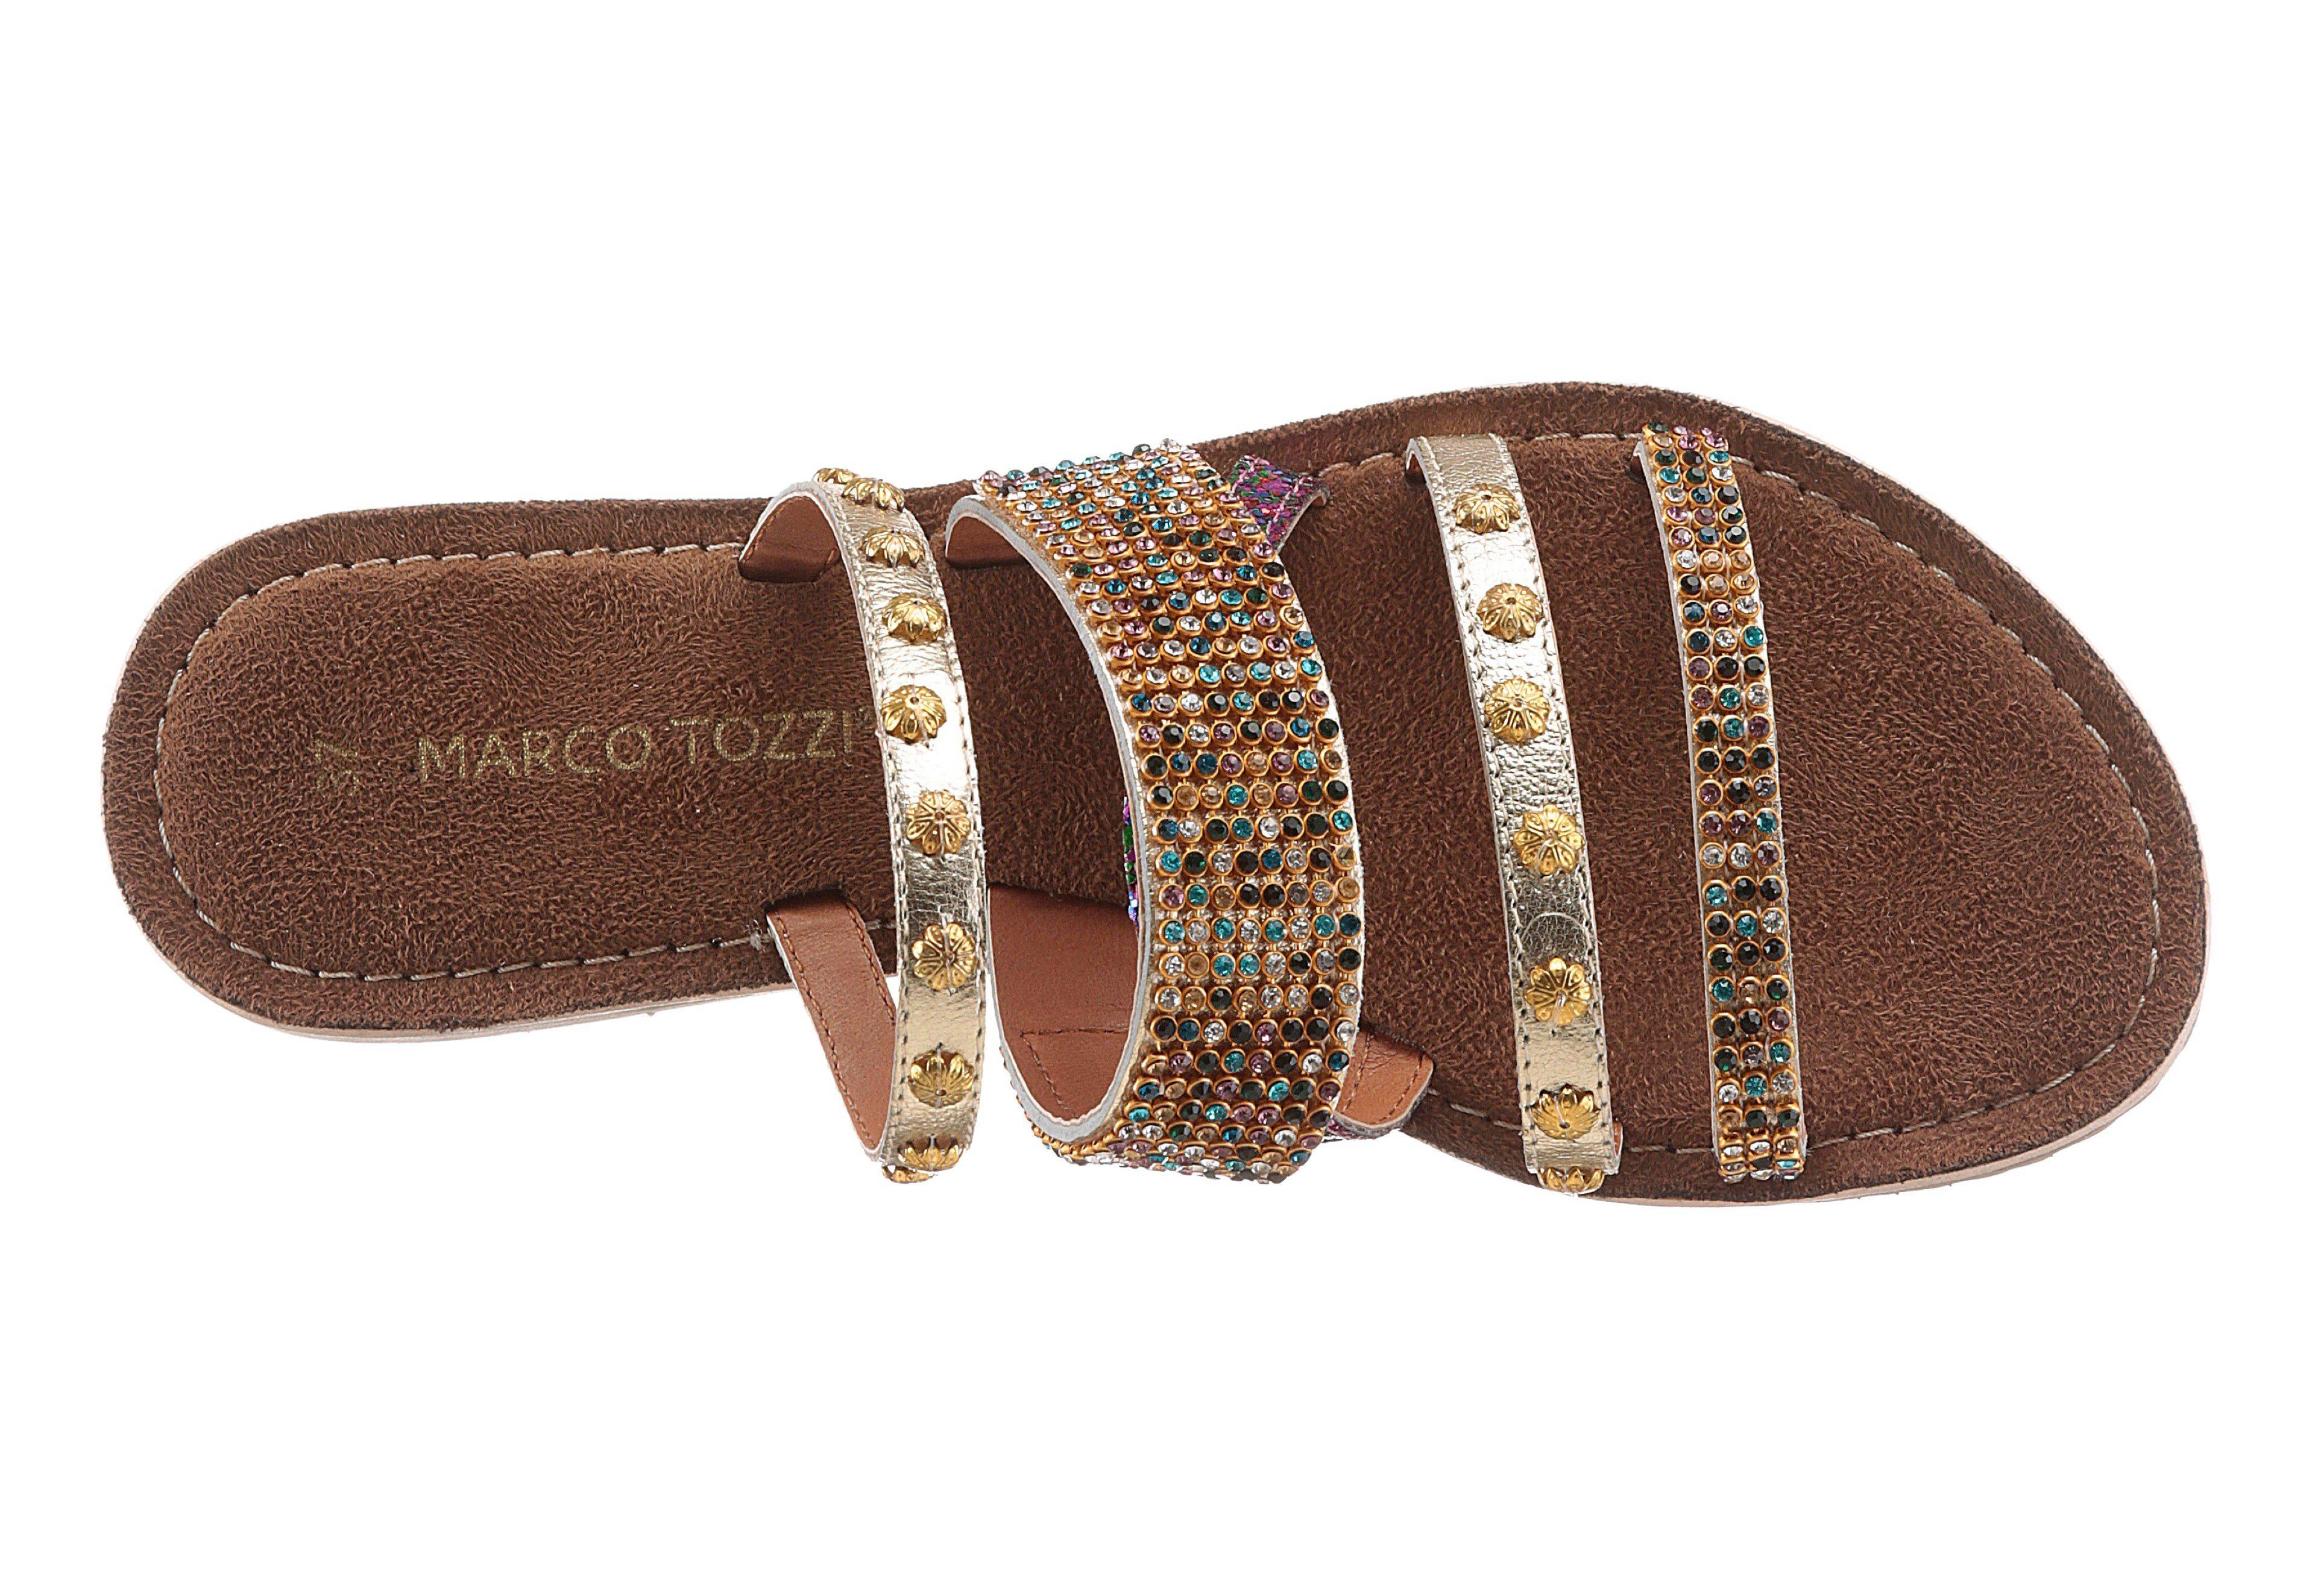 Marco Tozzi Pantolette, reich verziert kaufen  goldfarben